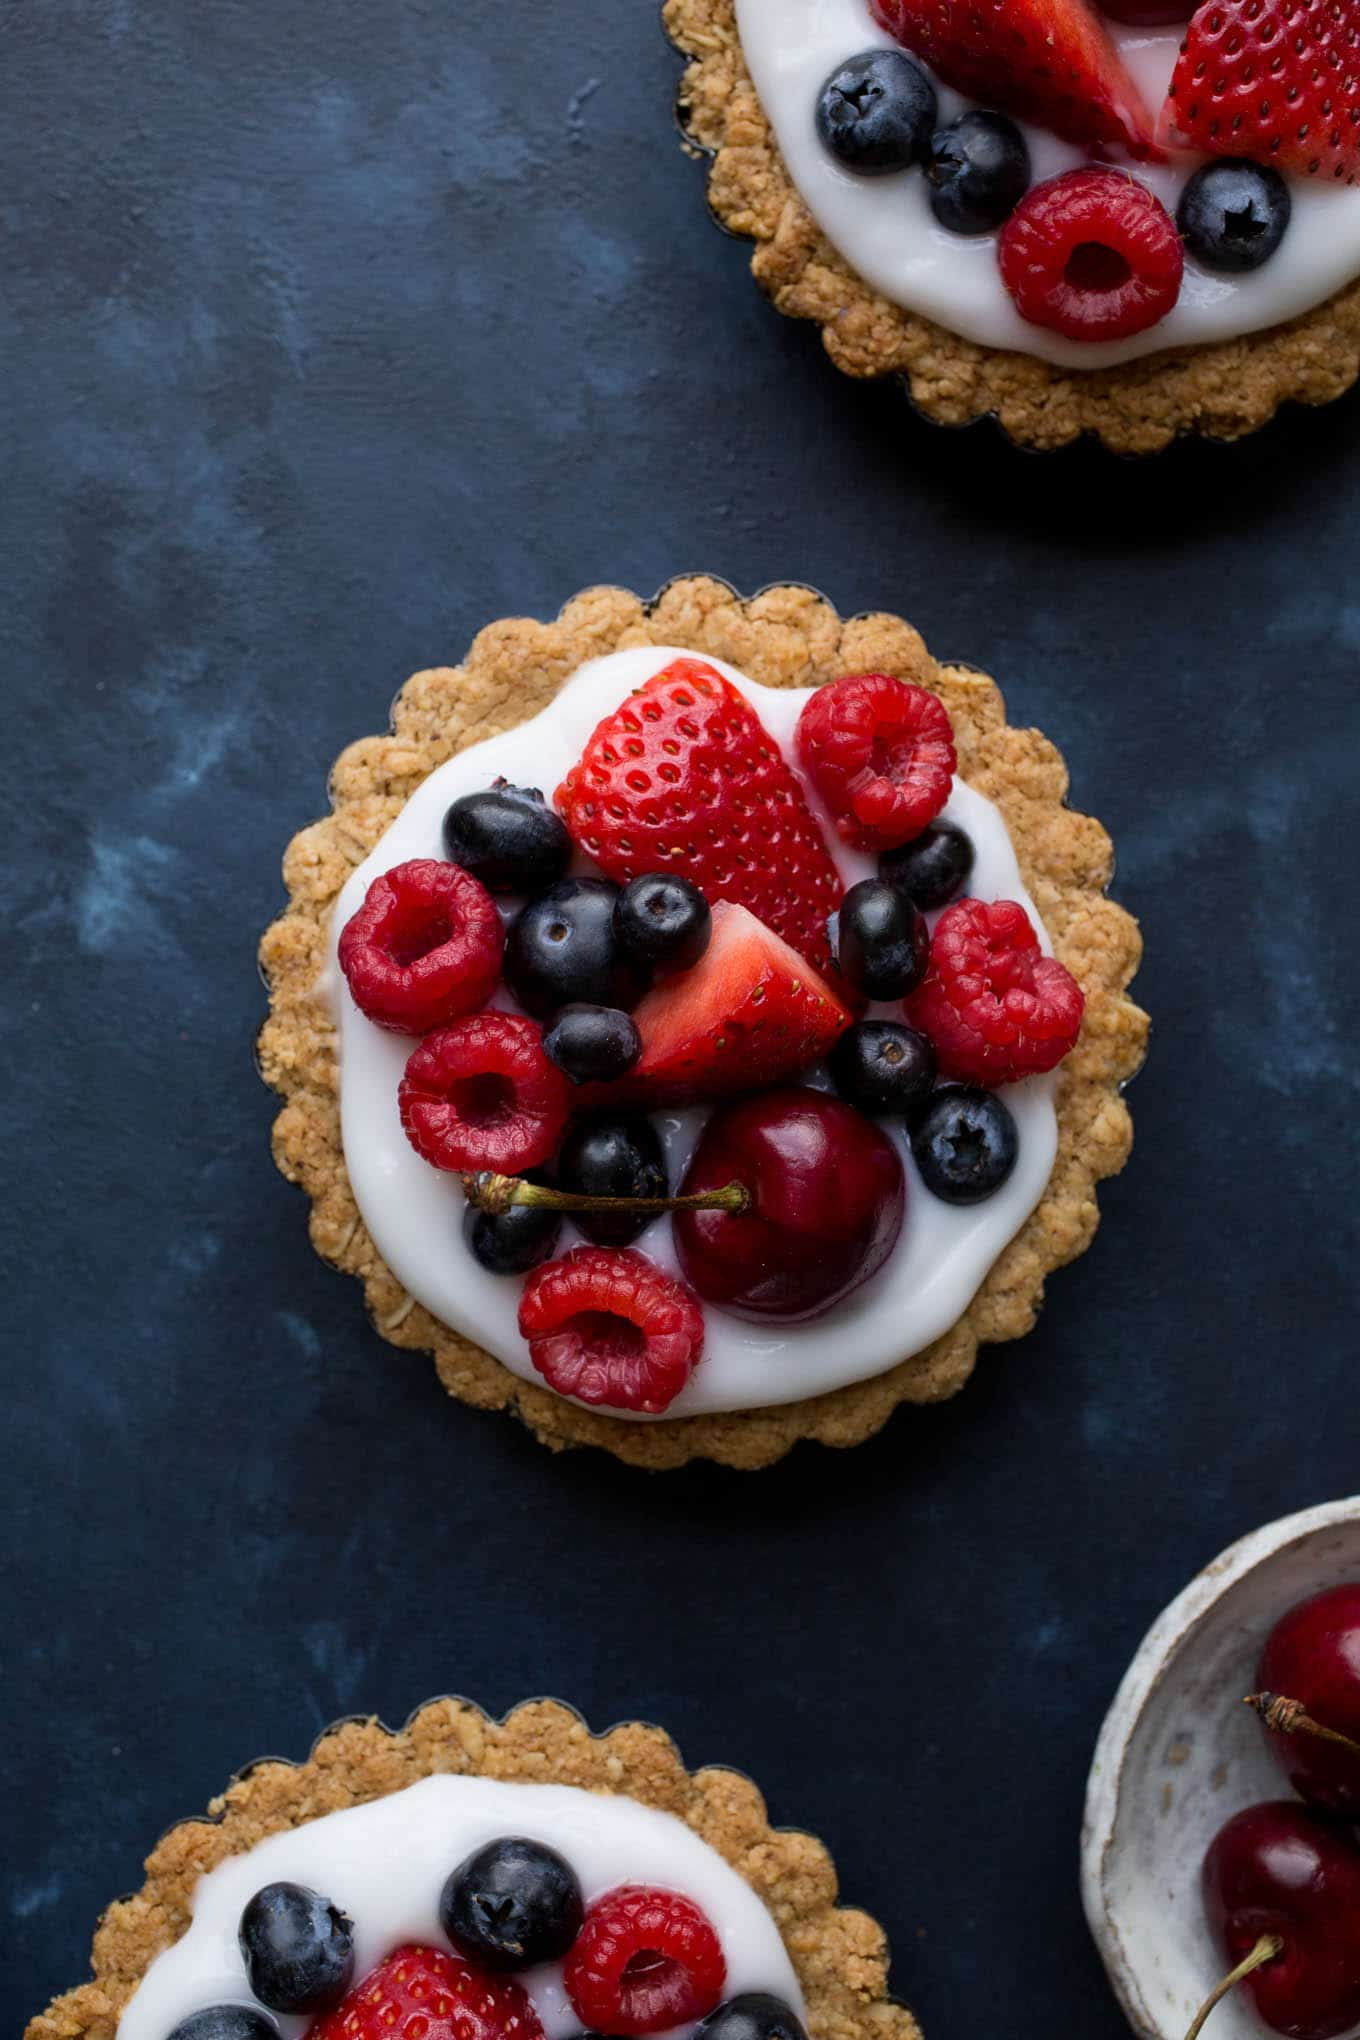 Fruit and Yogurt Granola Tarts from Vegetarian Heartland (gluten-free, vegan, refined sugar-free)